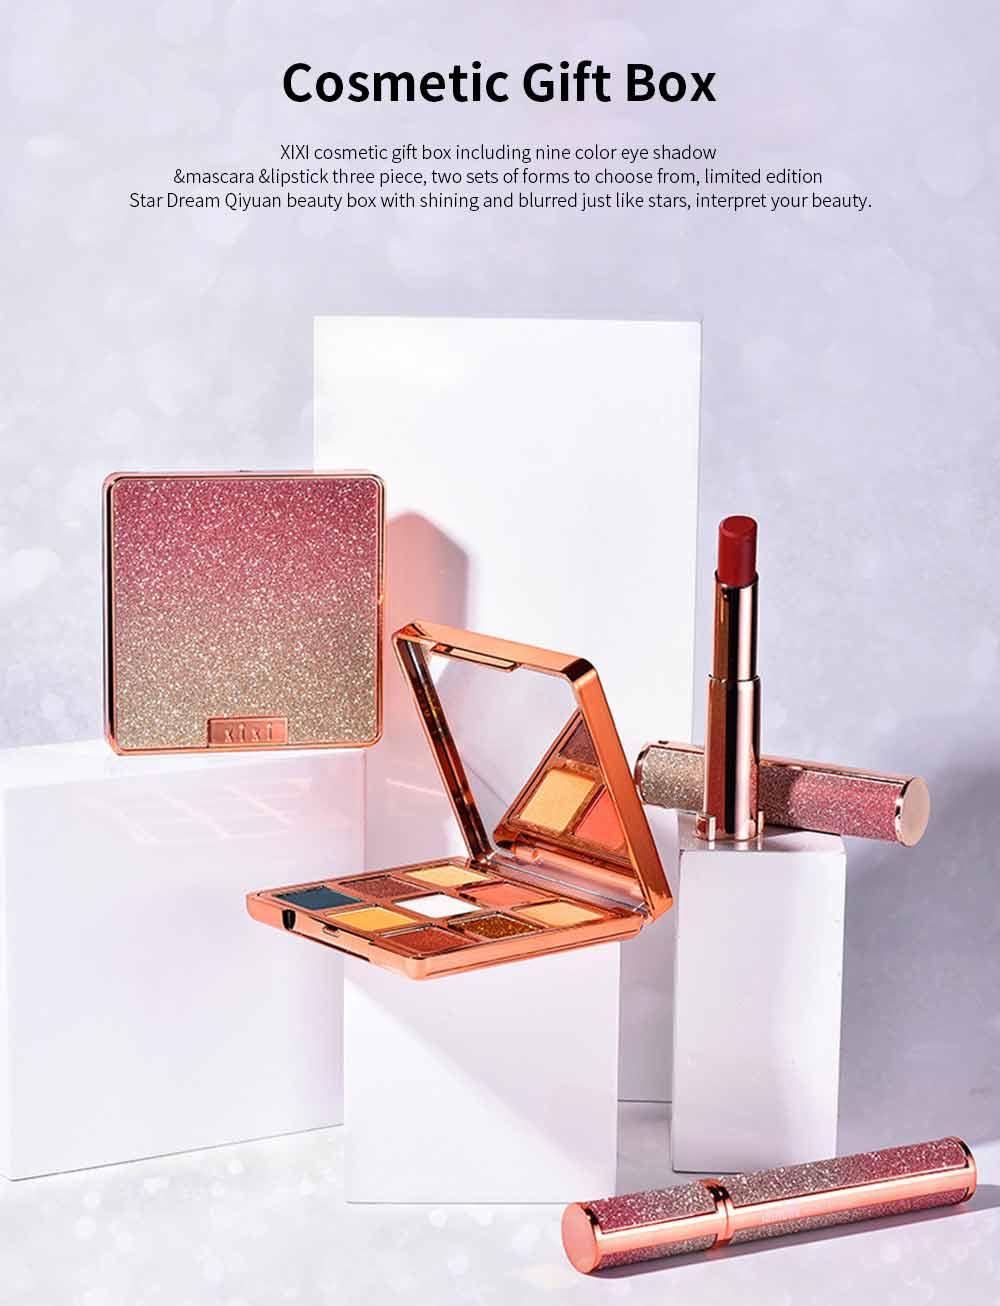 9 Color Eye Shadow & Mascara & Lipstick Set Beauty Makeup Birthday Cosmetic Gift Box Set 0